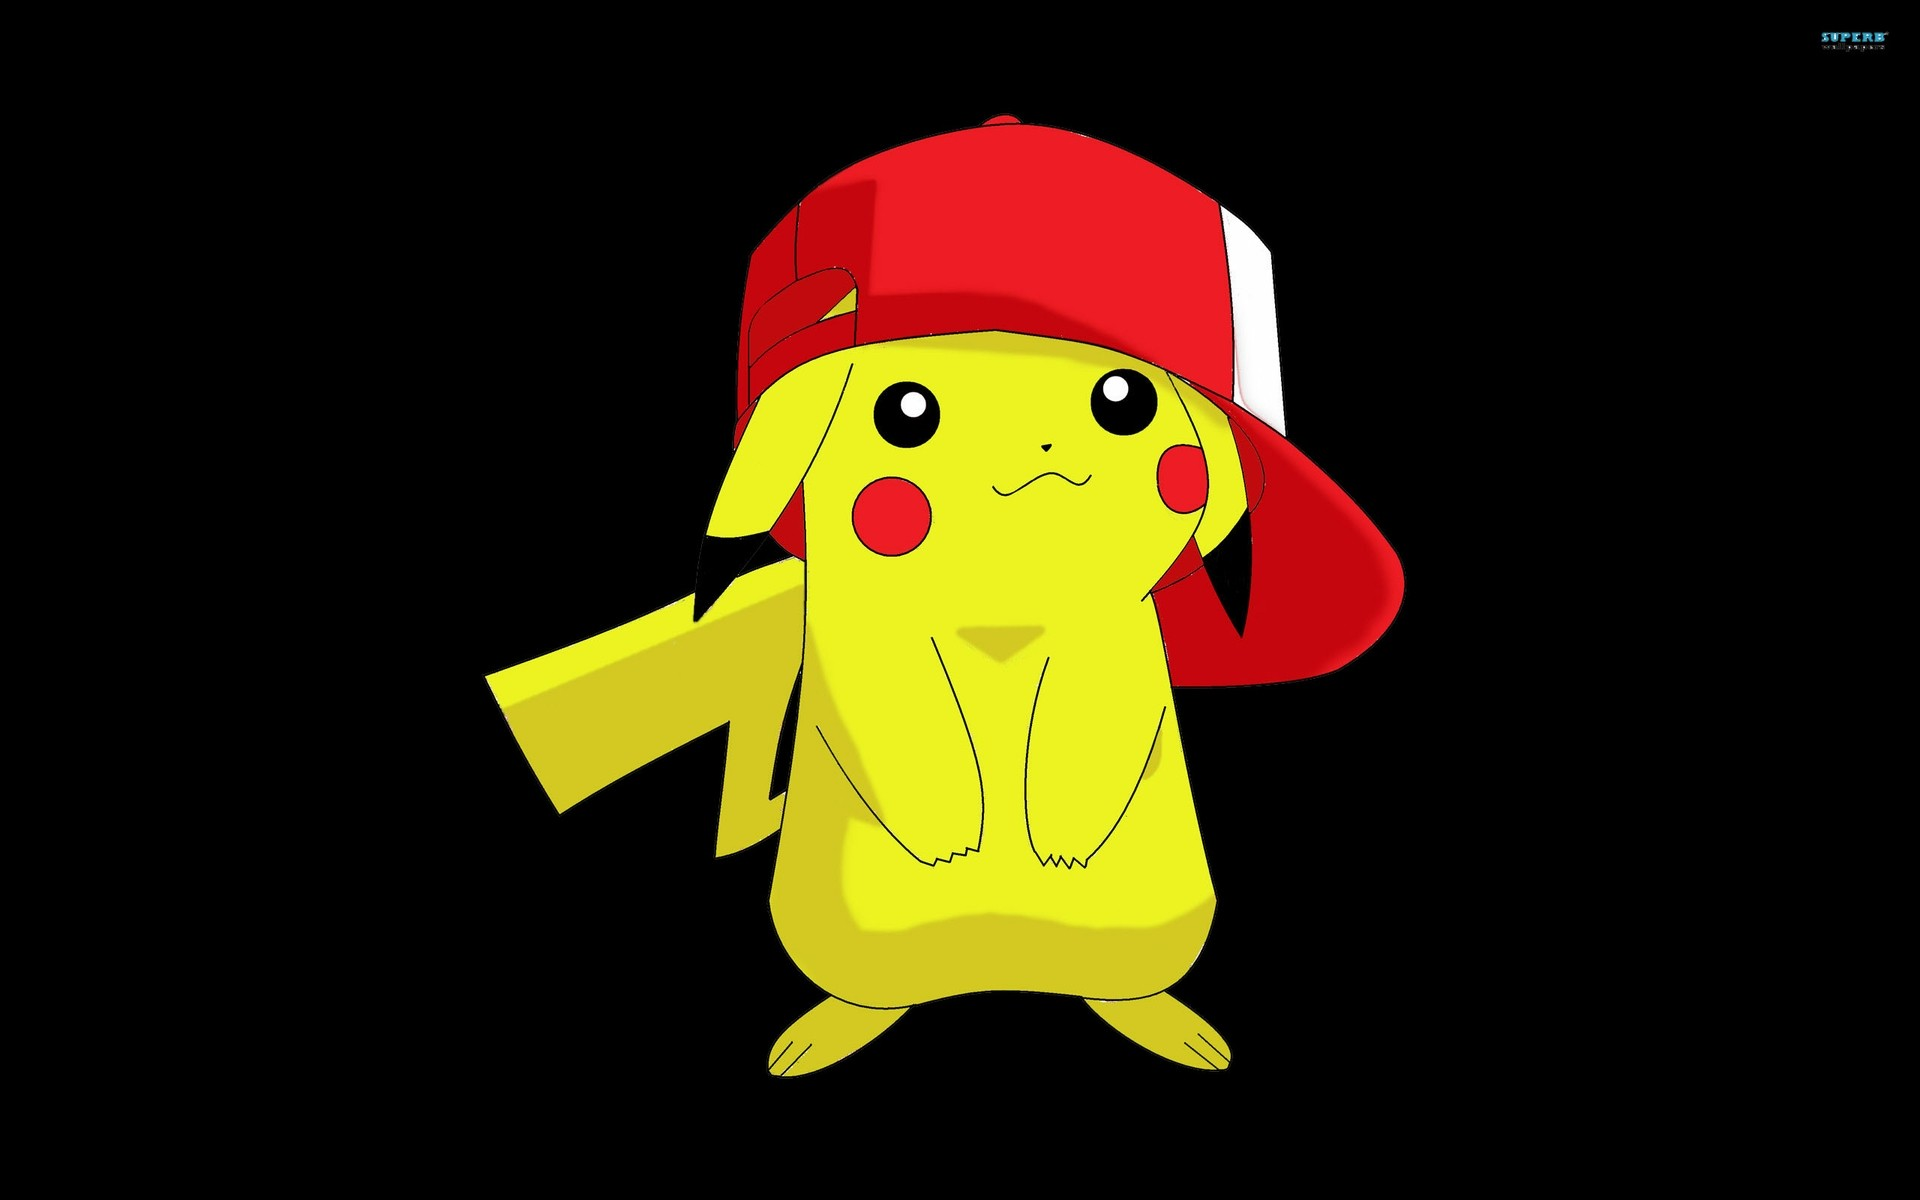 Pokemon Hd Wallpaper Download Free Awesome High